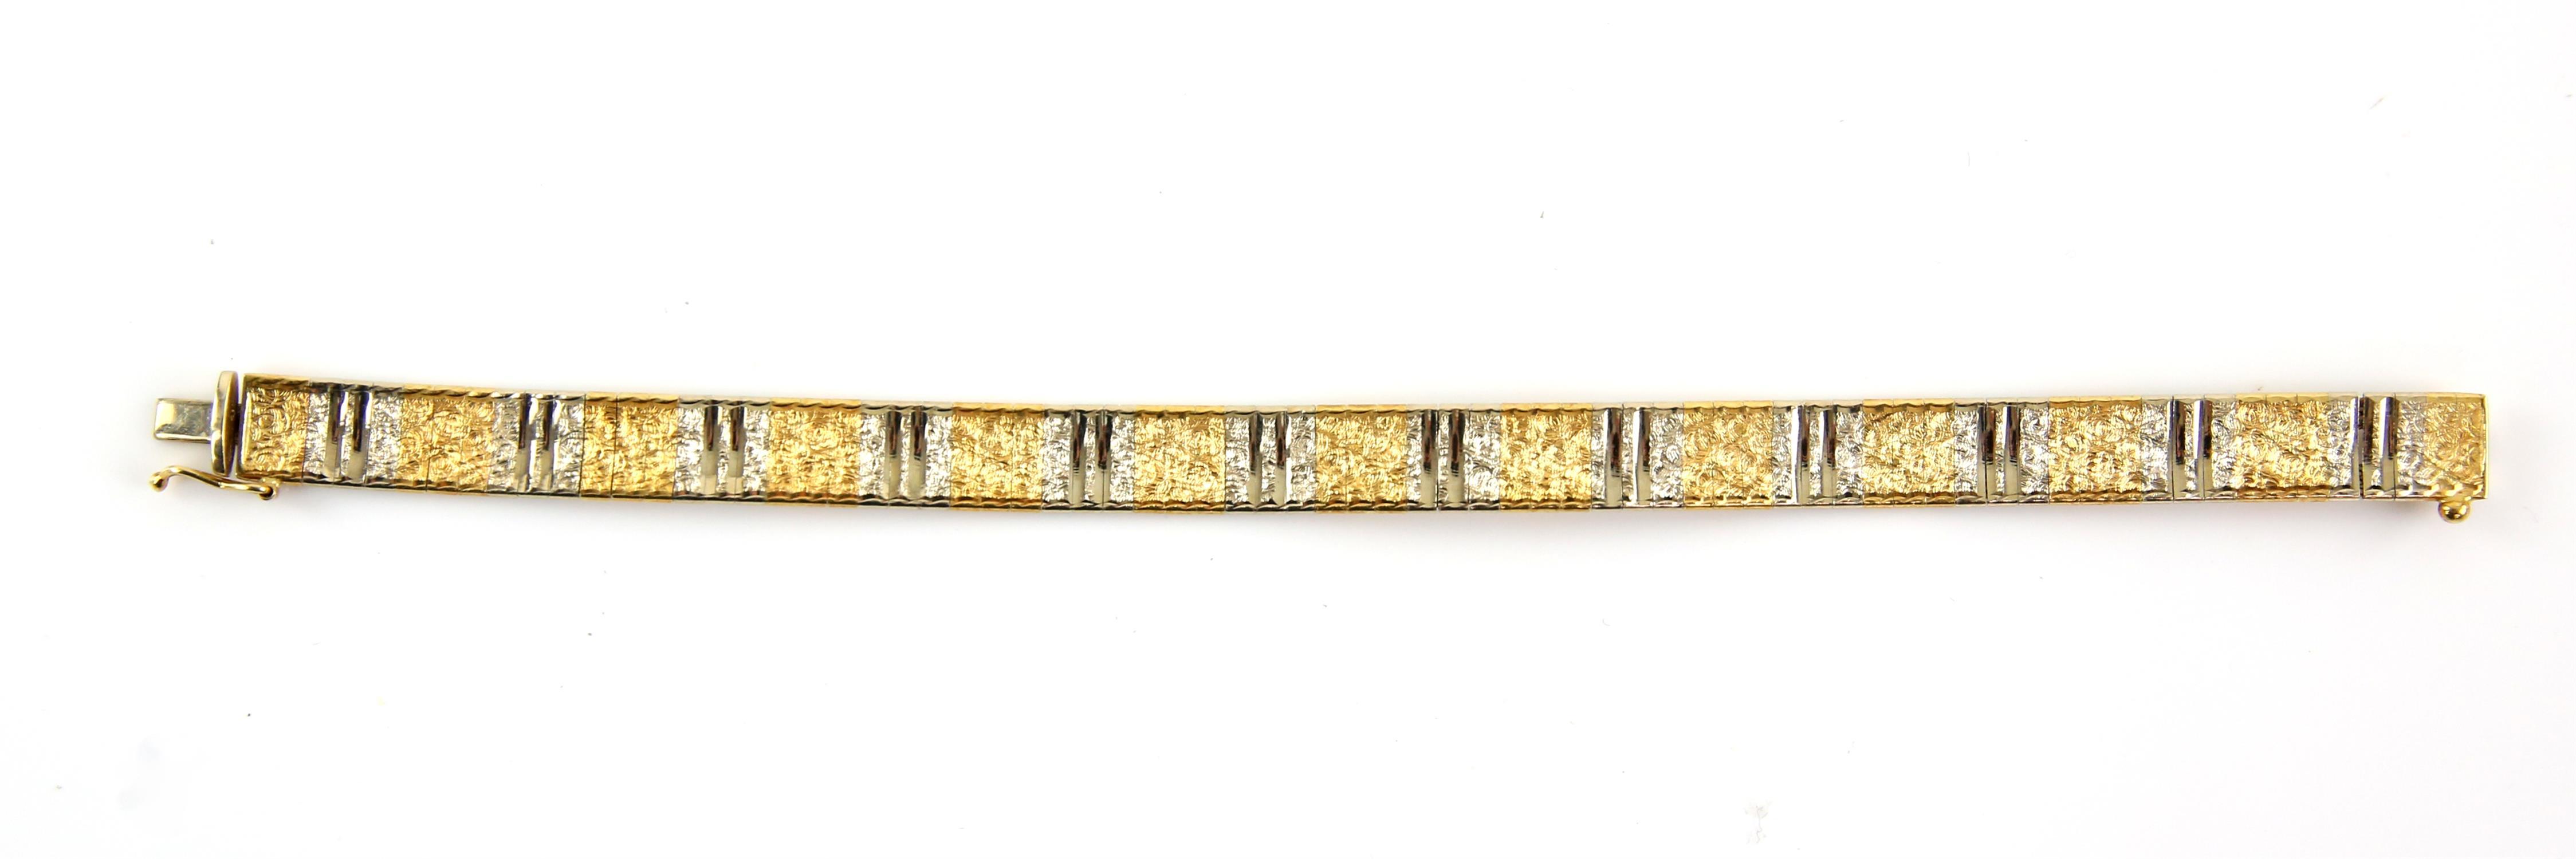 Bi-colour gold fancy link bracelet, with engraved and polished concave gold links, - Image 2 of 2